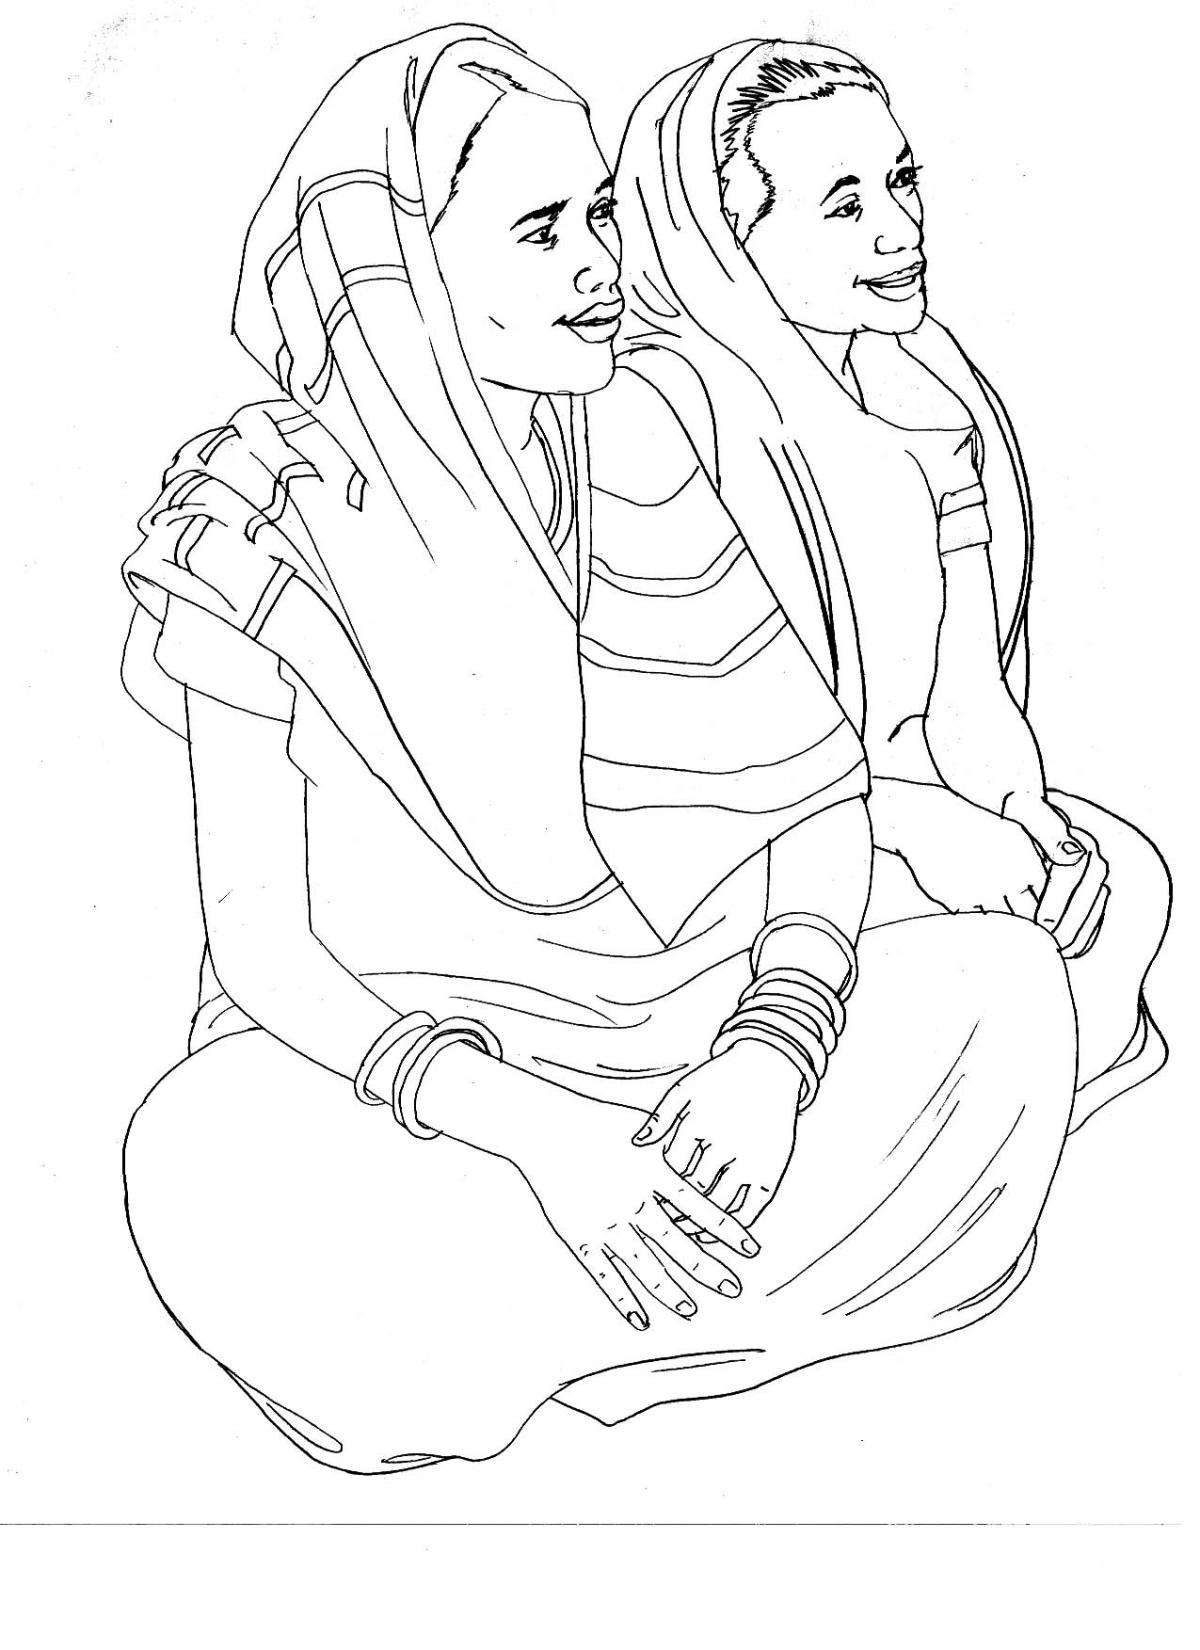 People - Women sitting - 01 - India